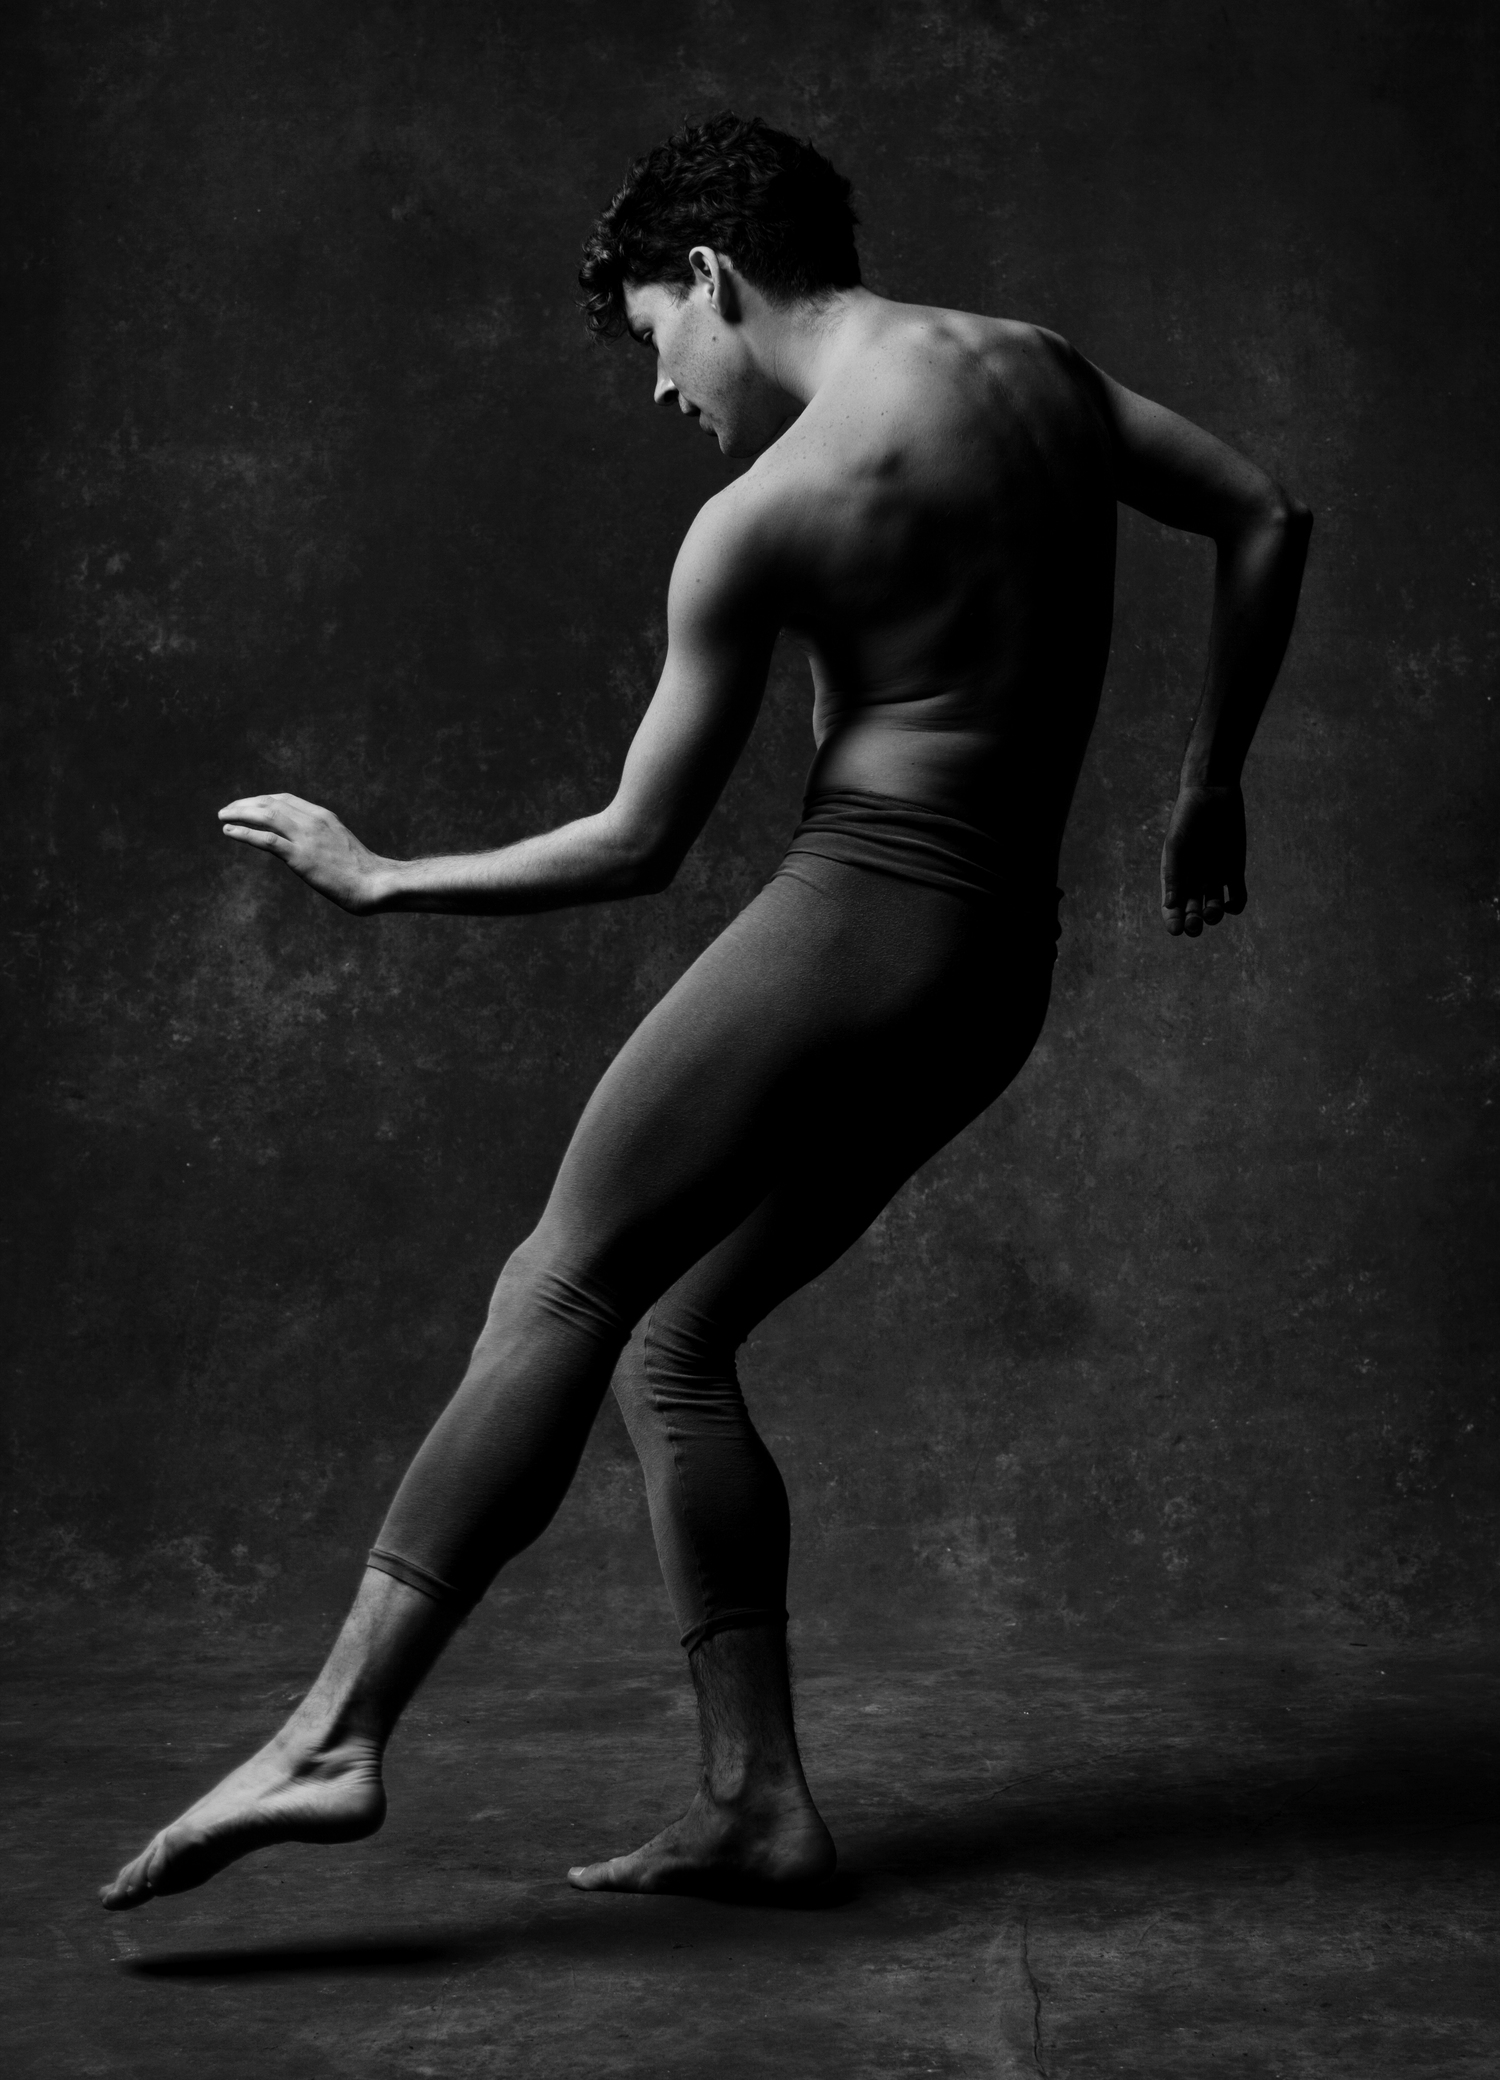 Photo by Erik Tanner